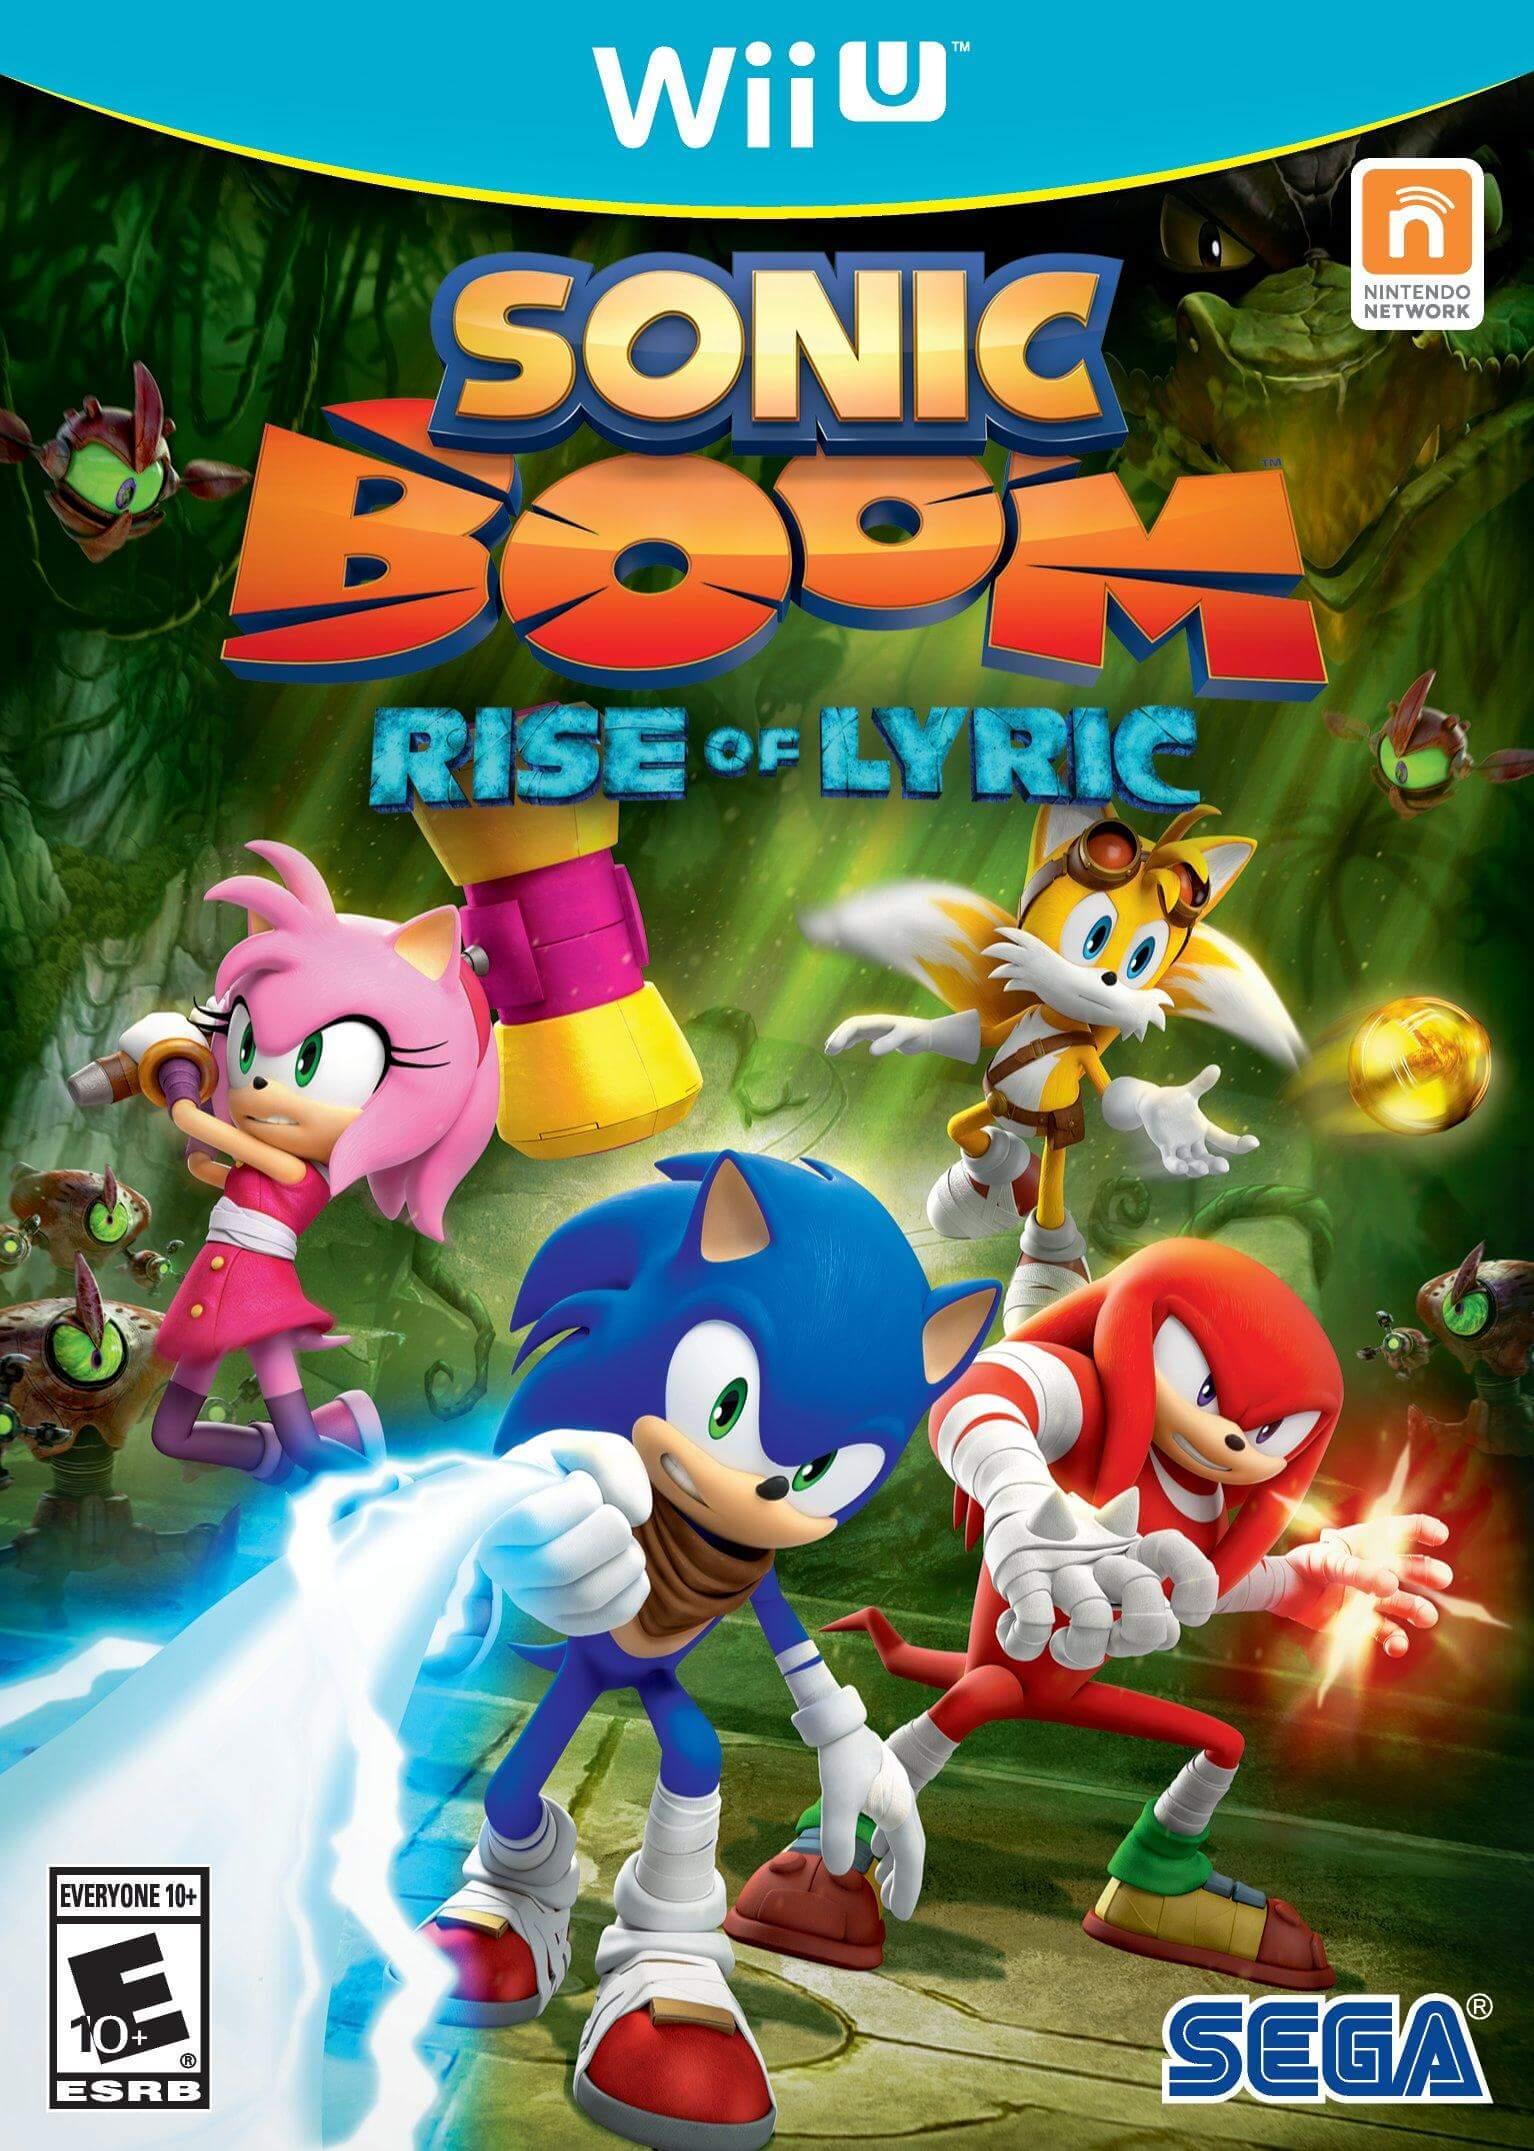 Sonic Boom Rise Of Lyric Wiiu Rom Iso Nintendo Wiiu Download